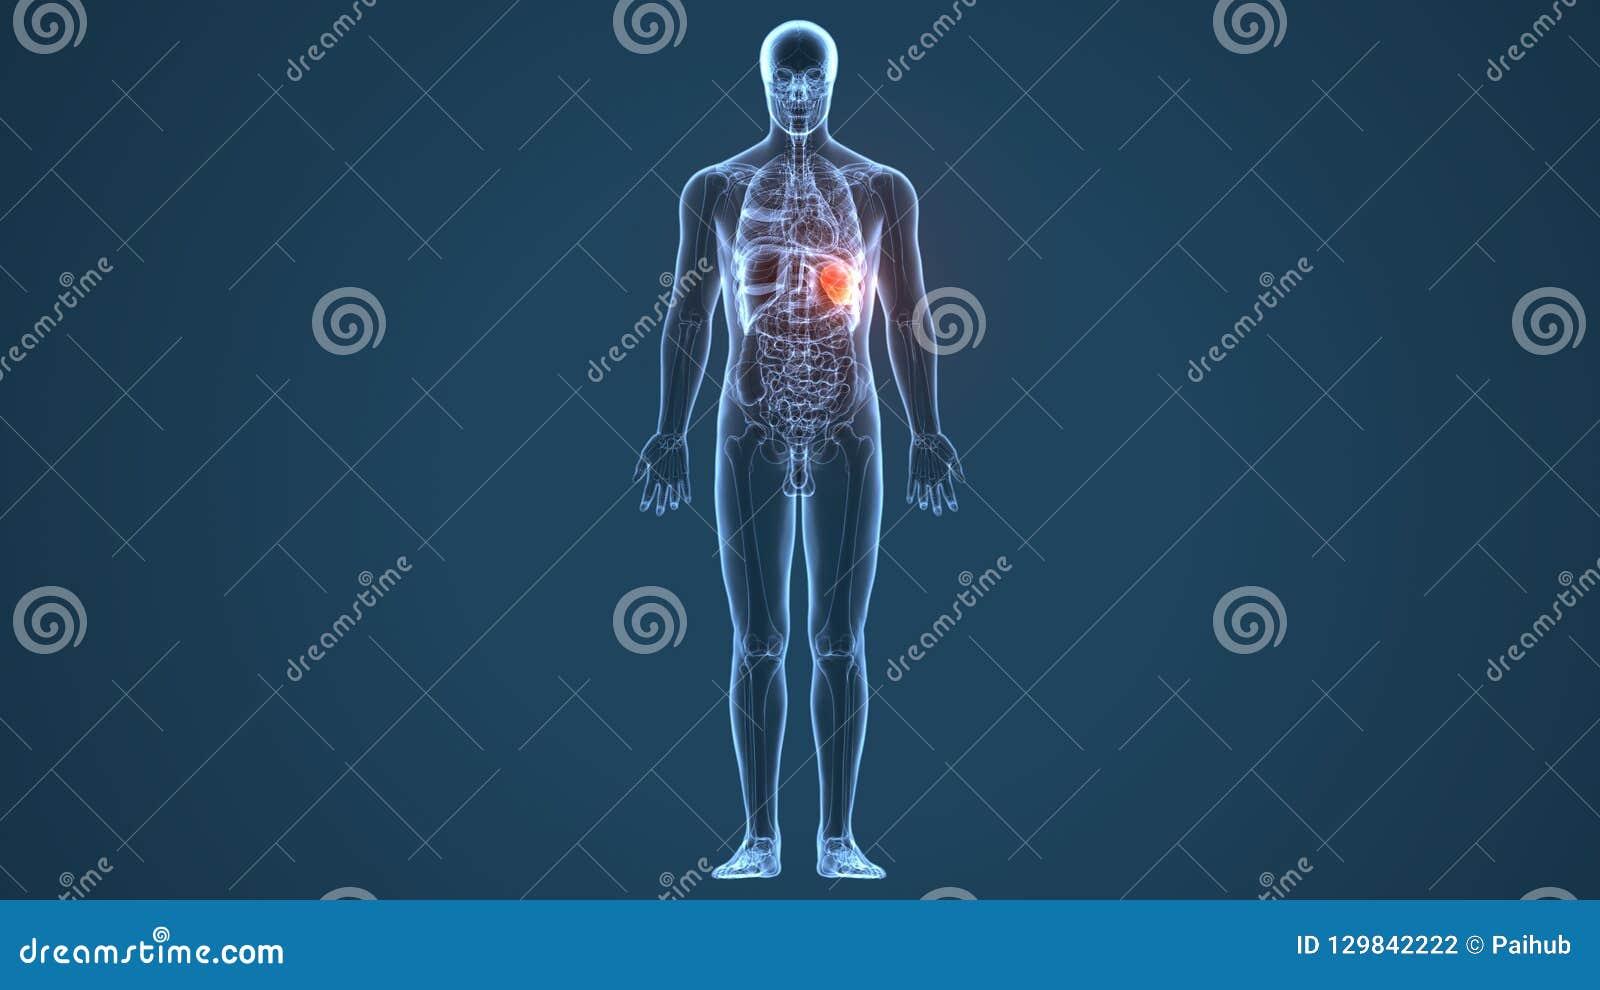 3d illustration of human body stomach anatomy